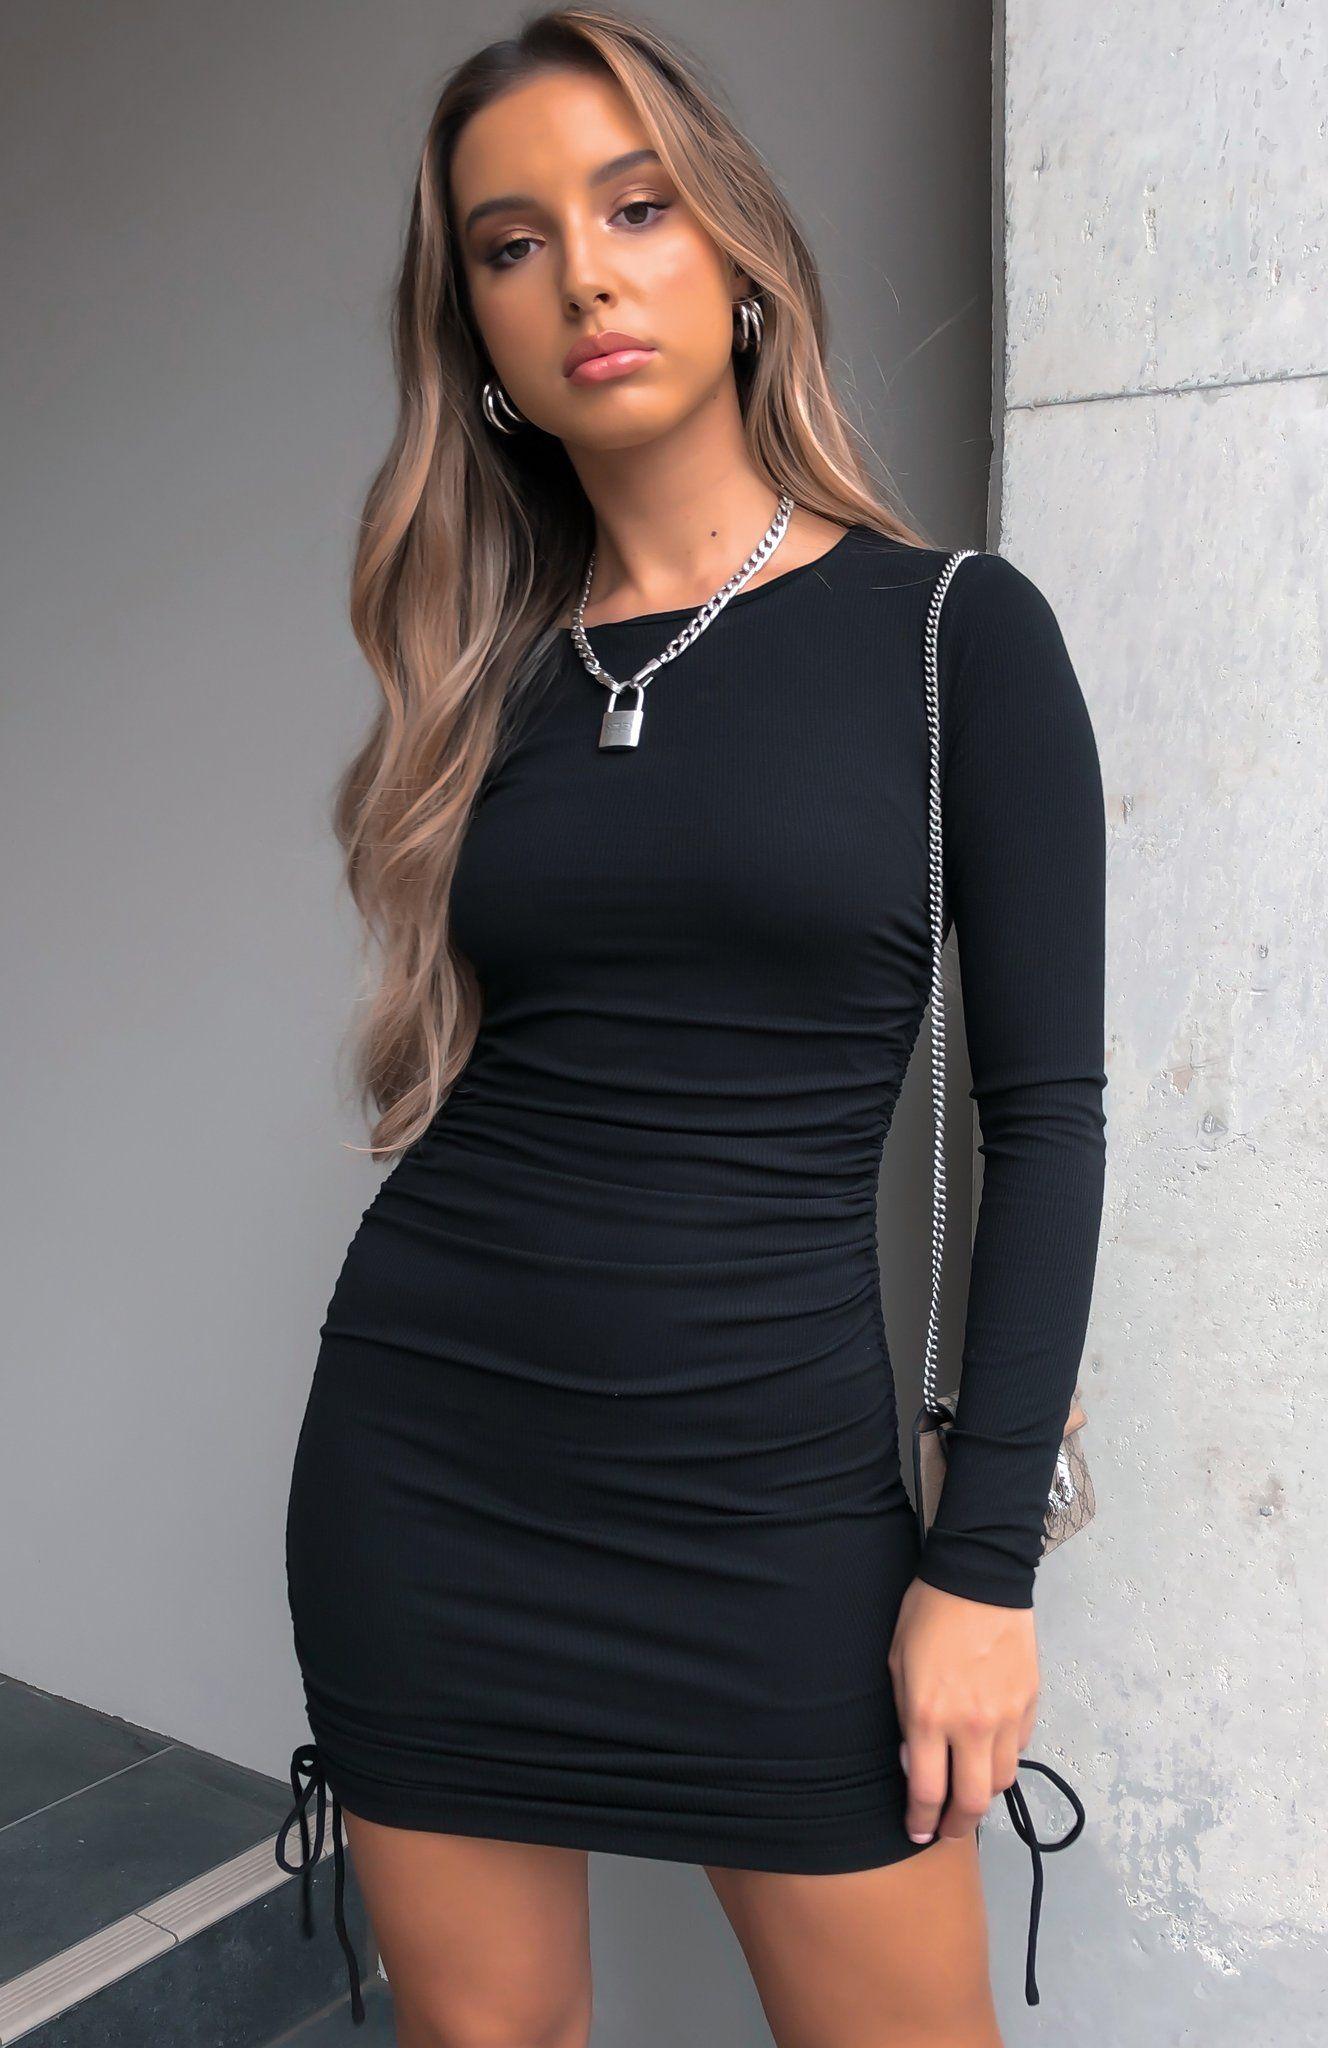 Sweet Salvation Long Sleeve Ribbed Mini Dress Black Long Sleeve Dress Outfit Tight Long Sleeve Dress Black Dress With Sleeves [ 2048 x 1328 Pixel ]